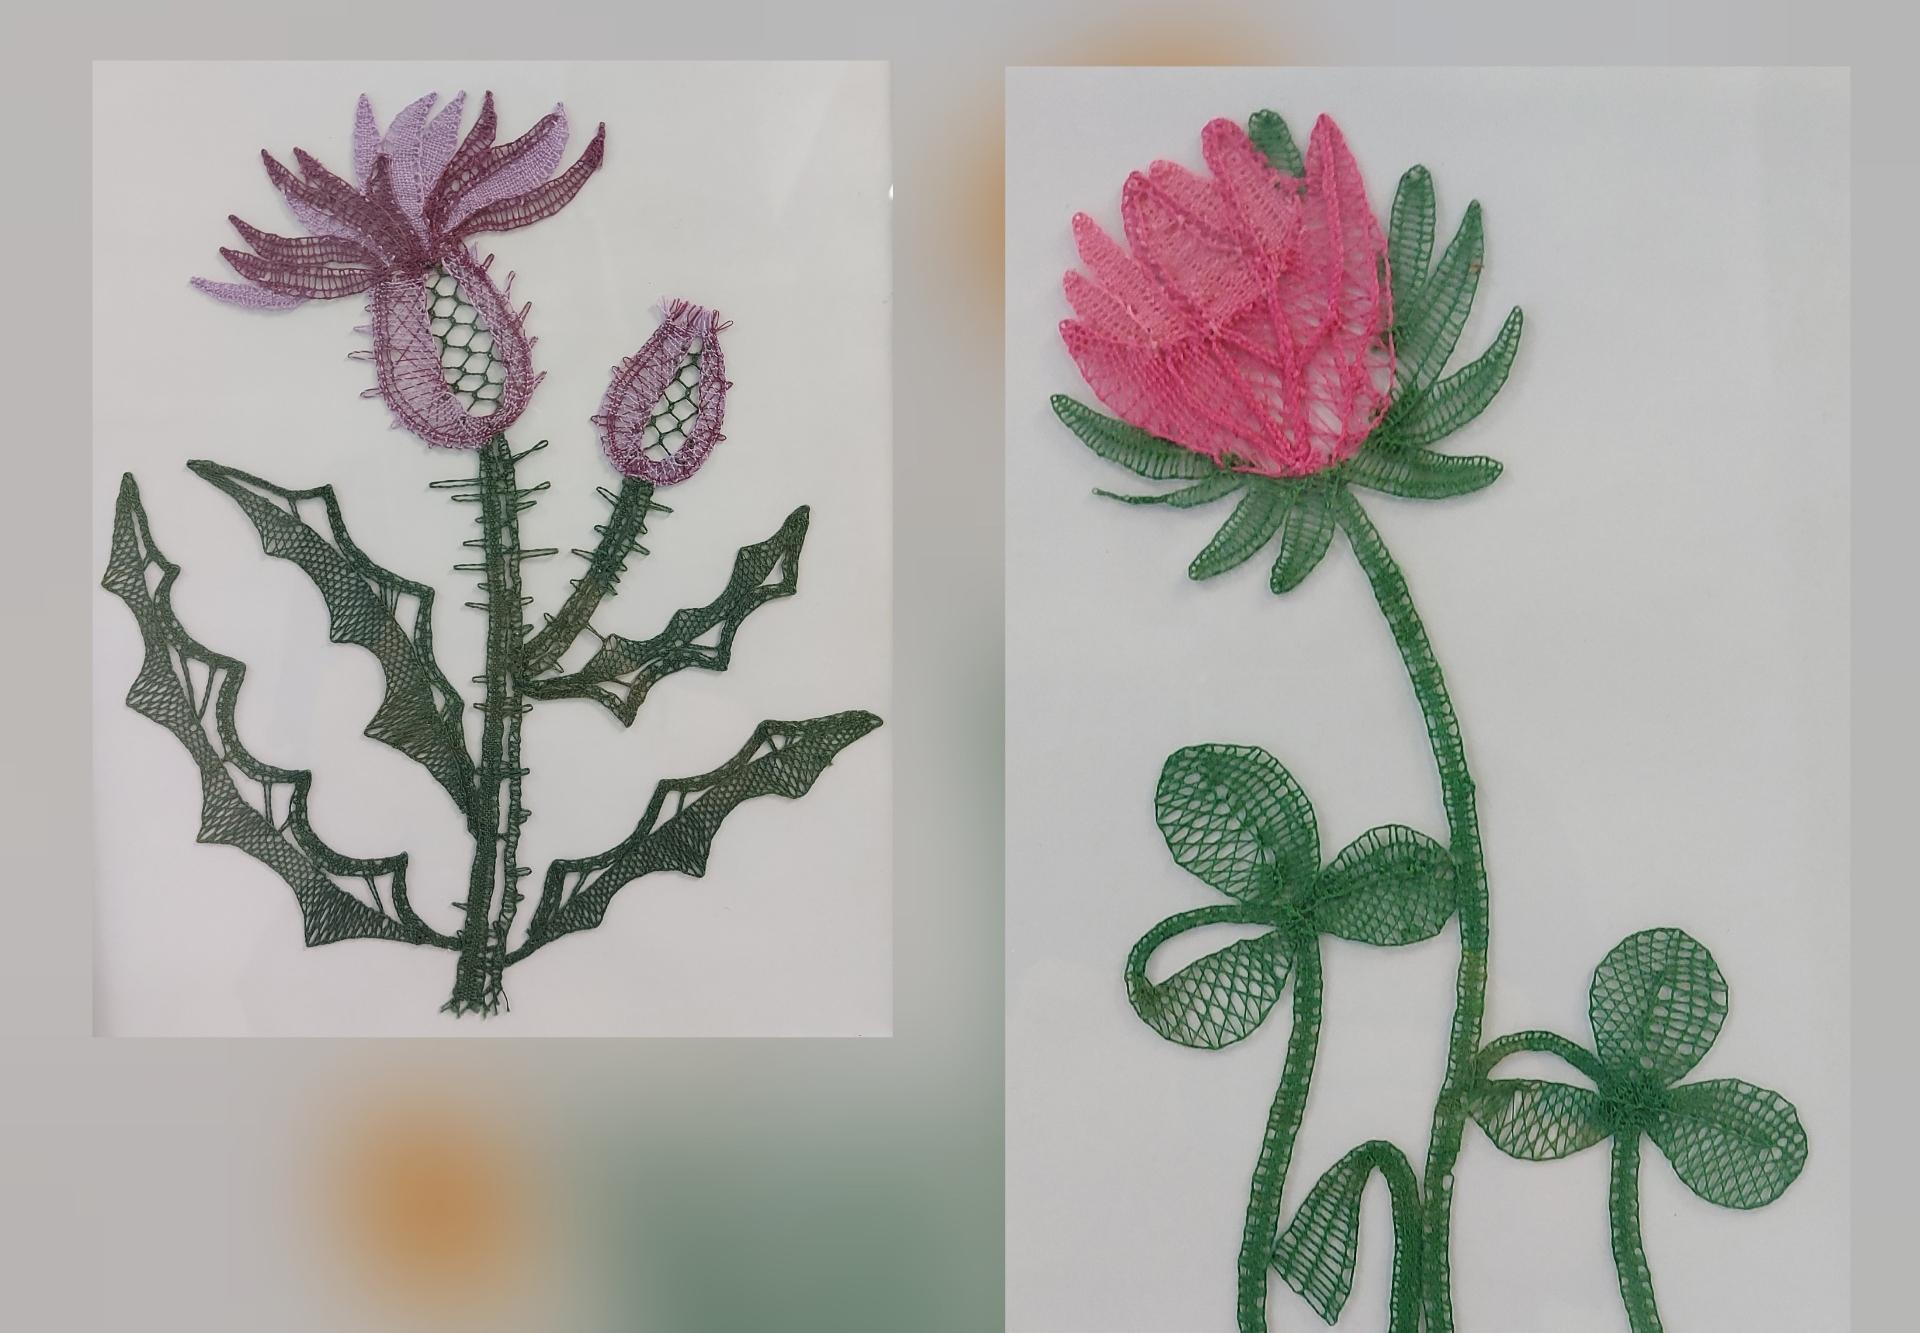 1rozce - Arhiv razstave